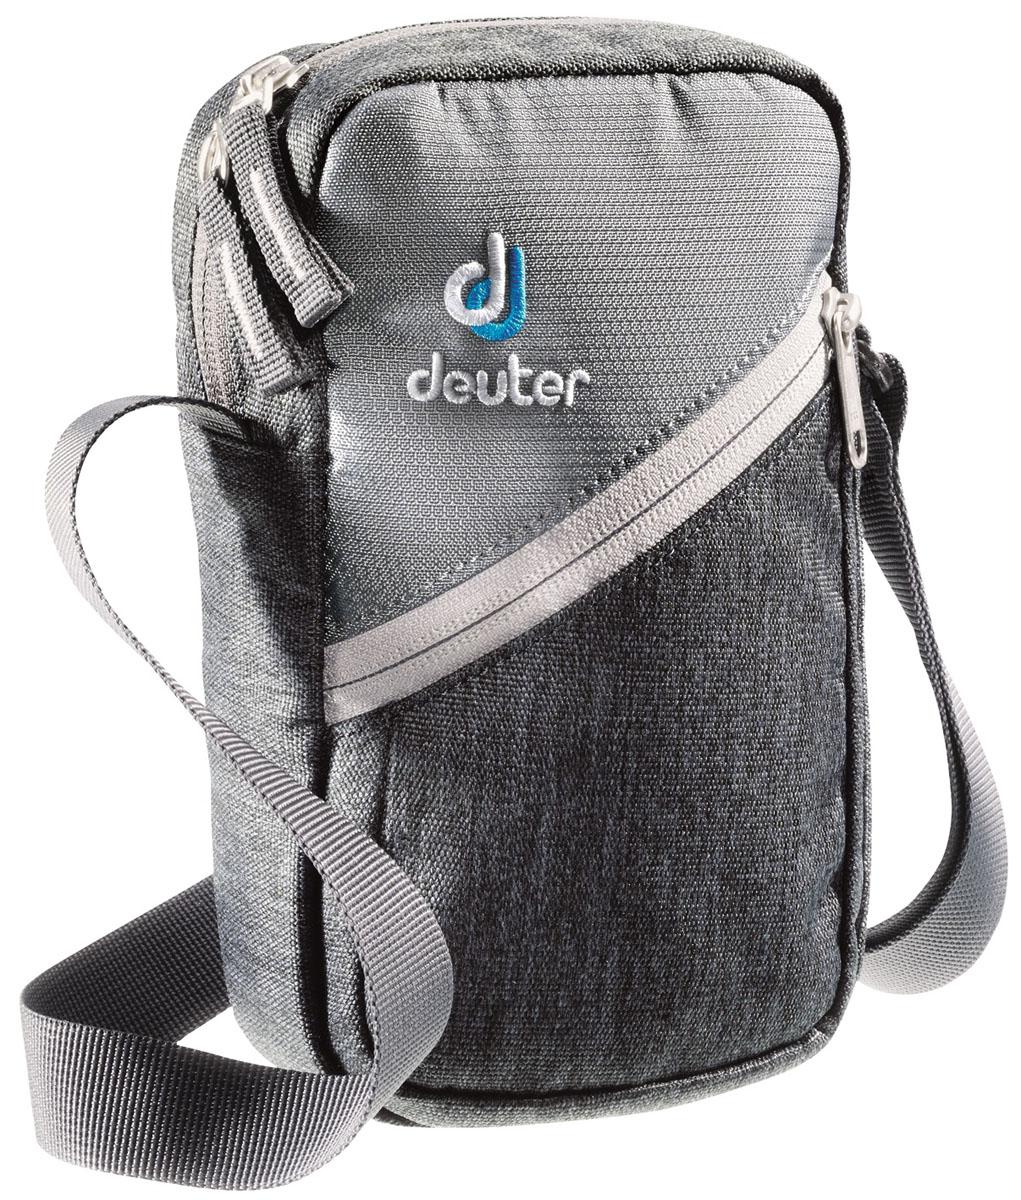 Сумка на плечо Deuter 2015 Shoulder bags Escape I, цвет: серый, 1л